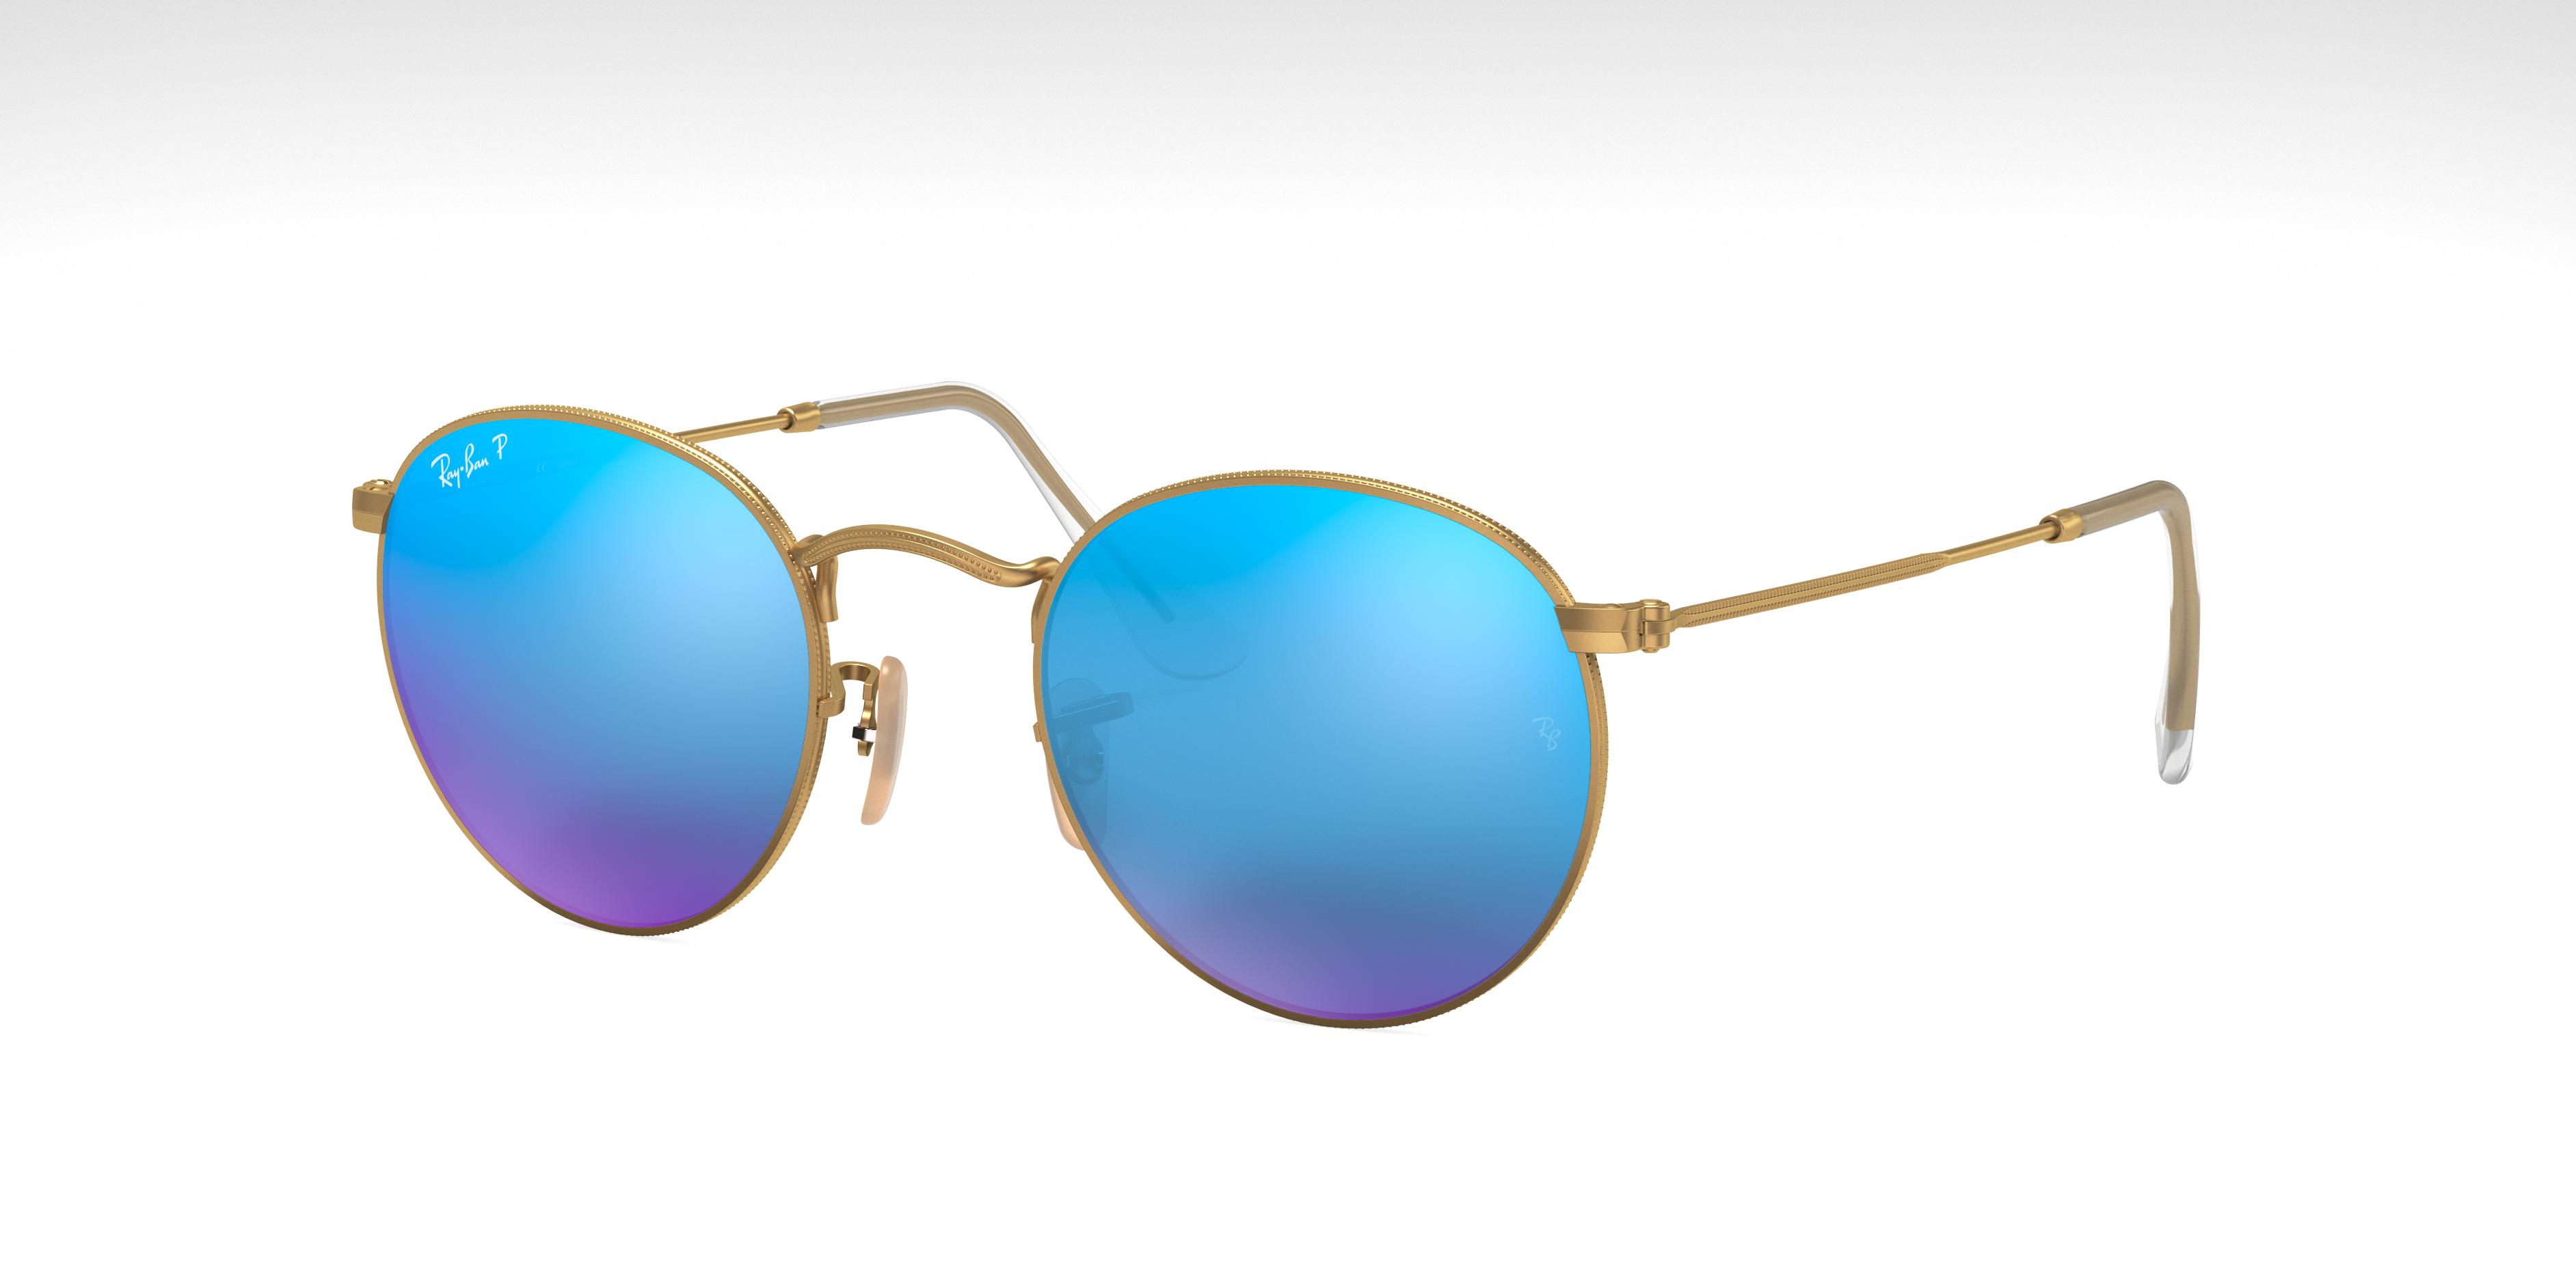 Ray-Ban Round Flash Lenses Gold, Polarized Blue Lenses - RB3447